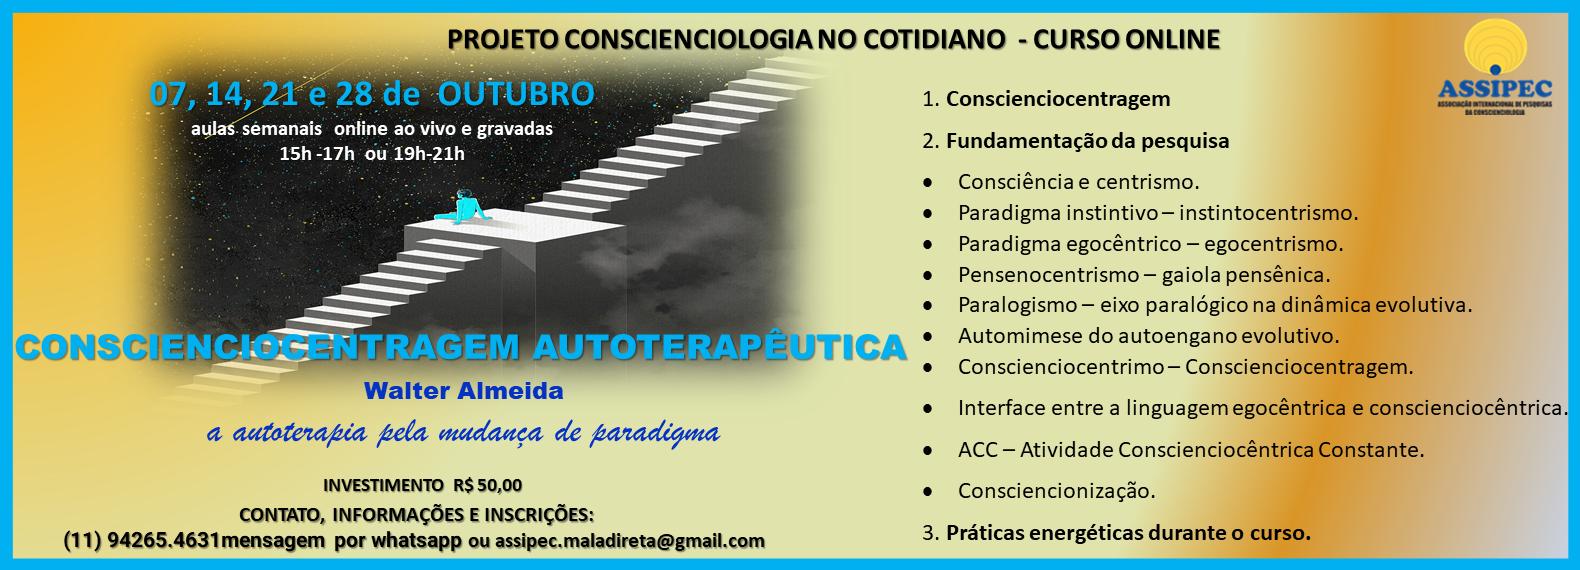 Site - CONSCIENCIOCENTRAGEM AUTOTERAPÊUTICA